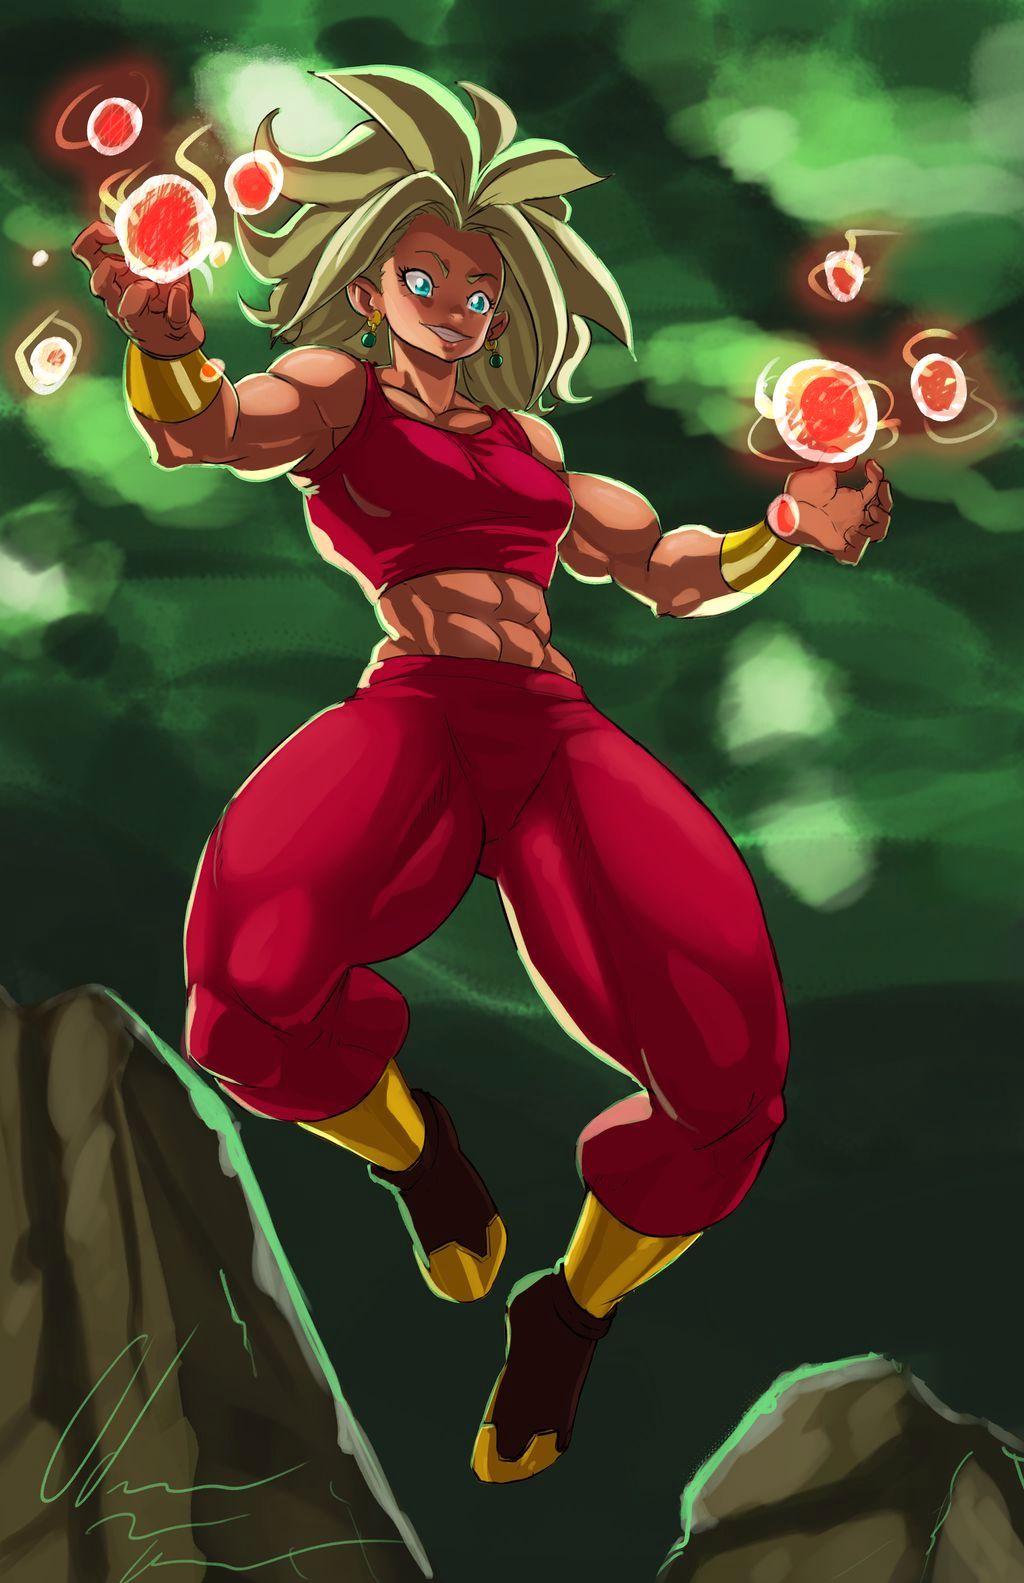 Kefla (normal Super Saiyan color) stand alone by